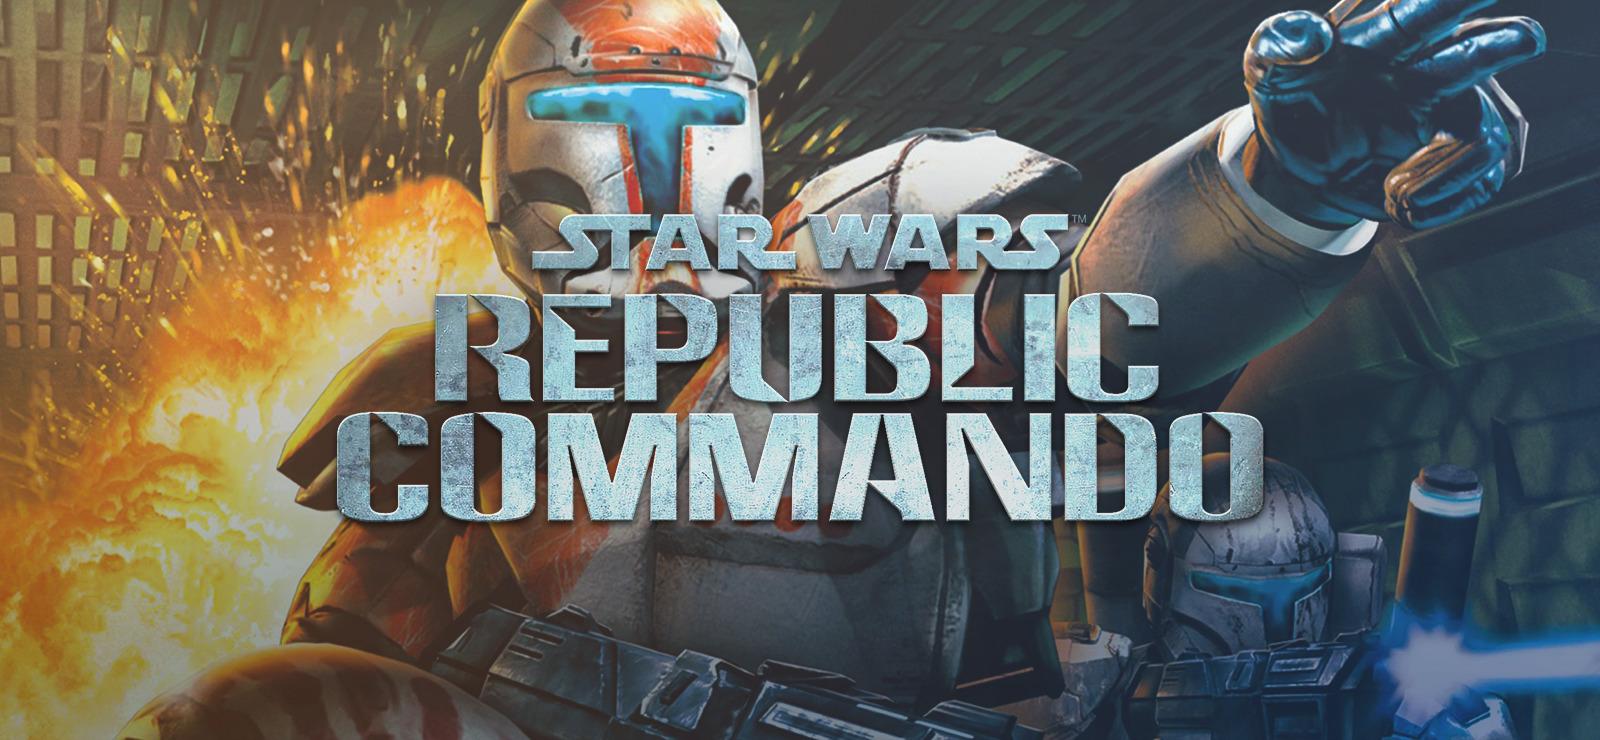 Star Wars: Republic Commando Details - LaunchBox Games